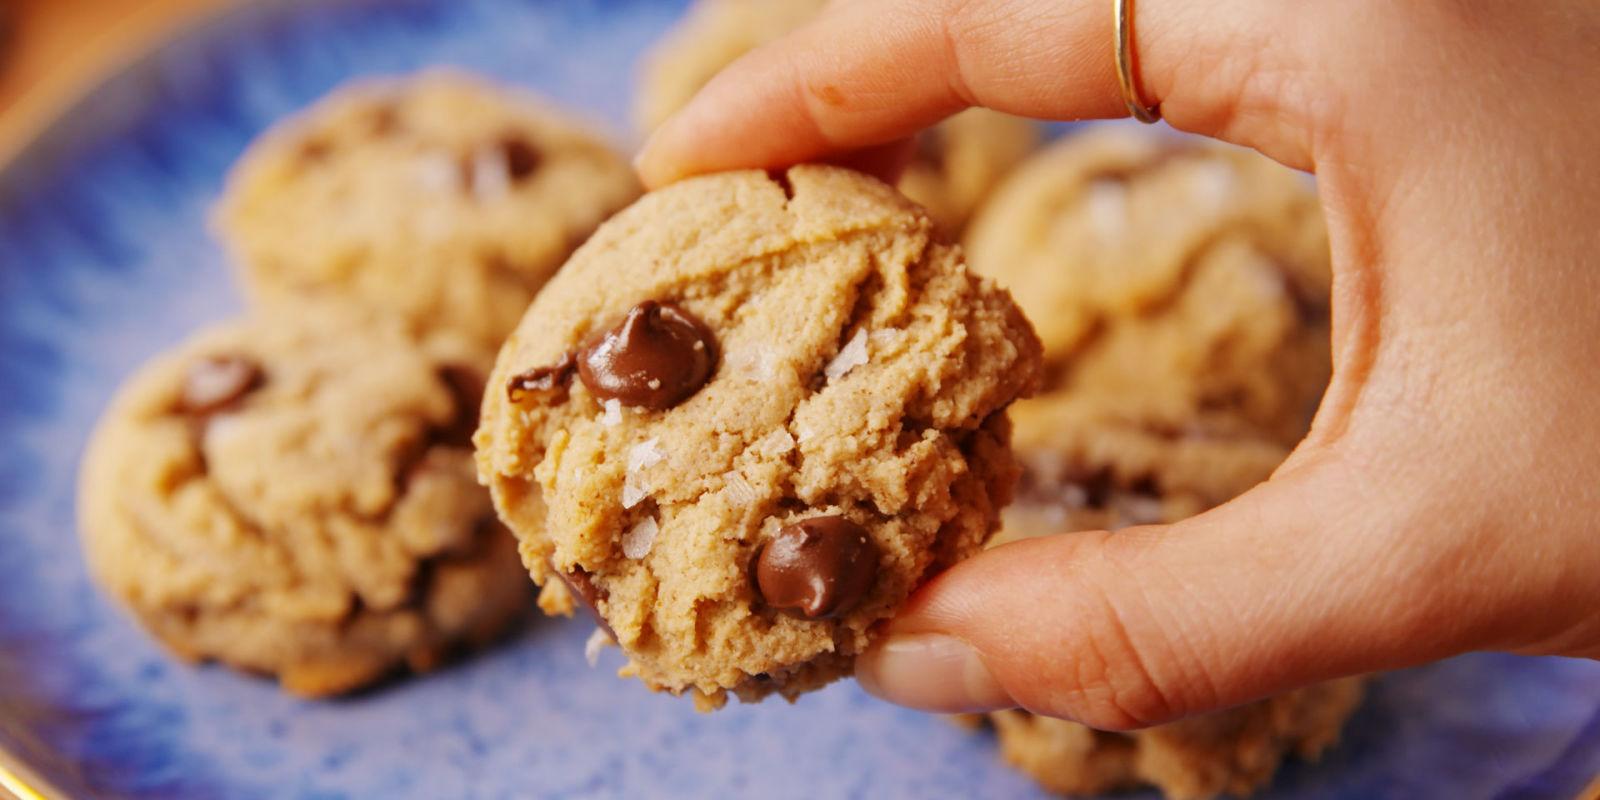 Best Paleo Chocolate Chip Cookies Recipe - How to Make Paleo ...